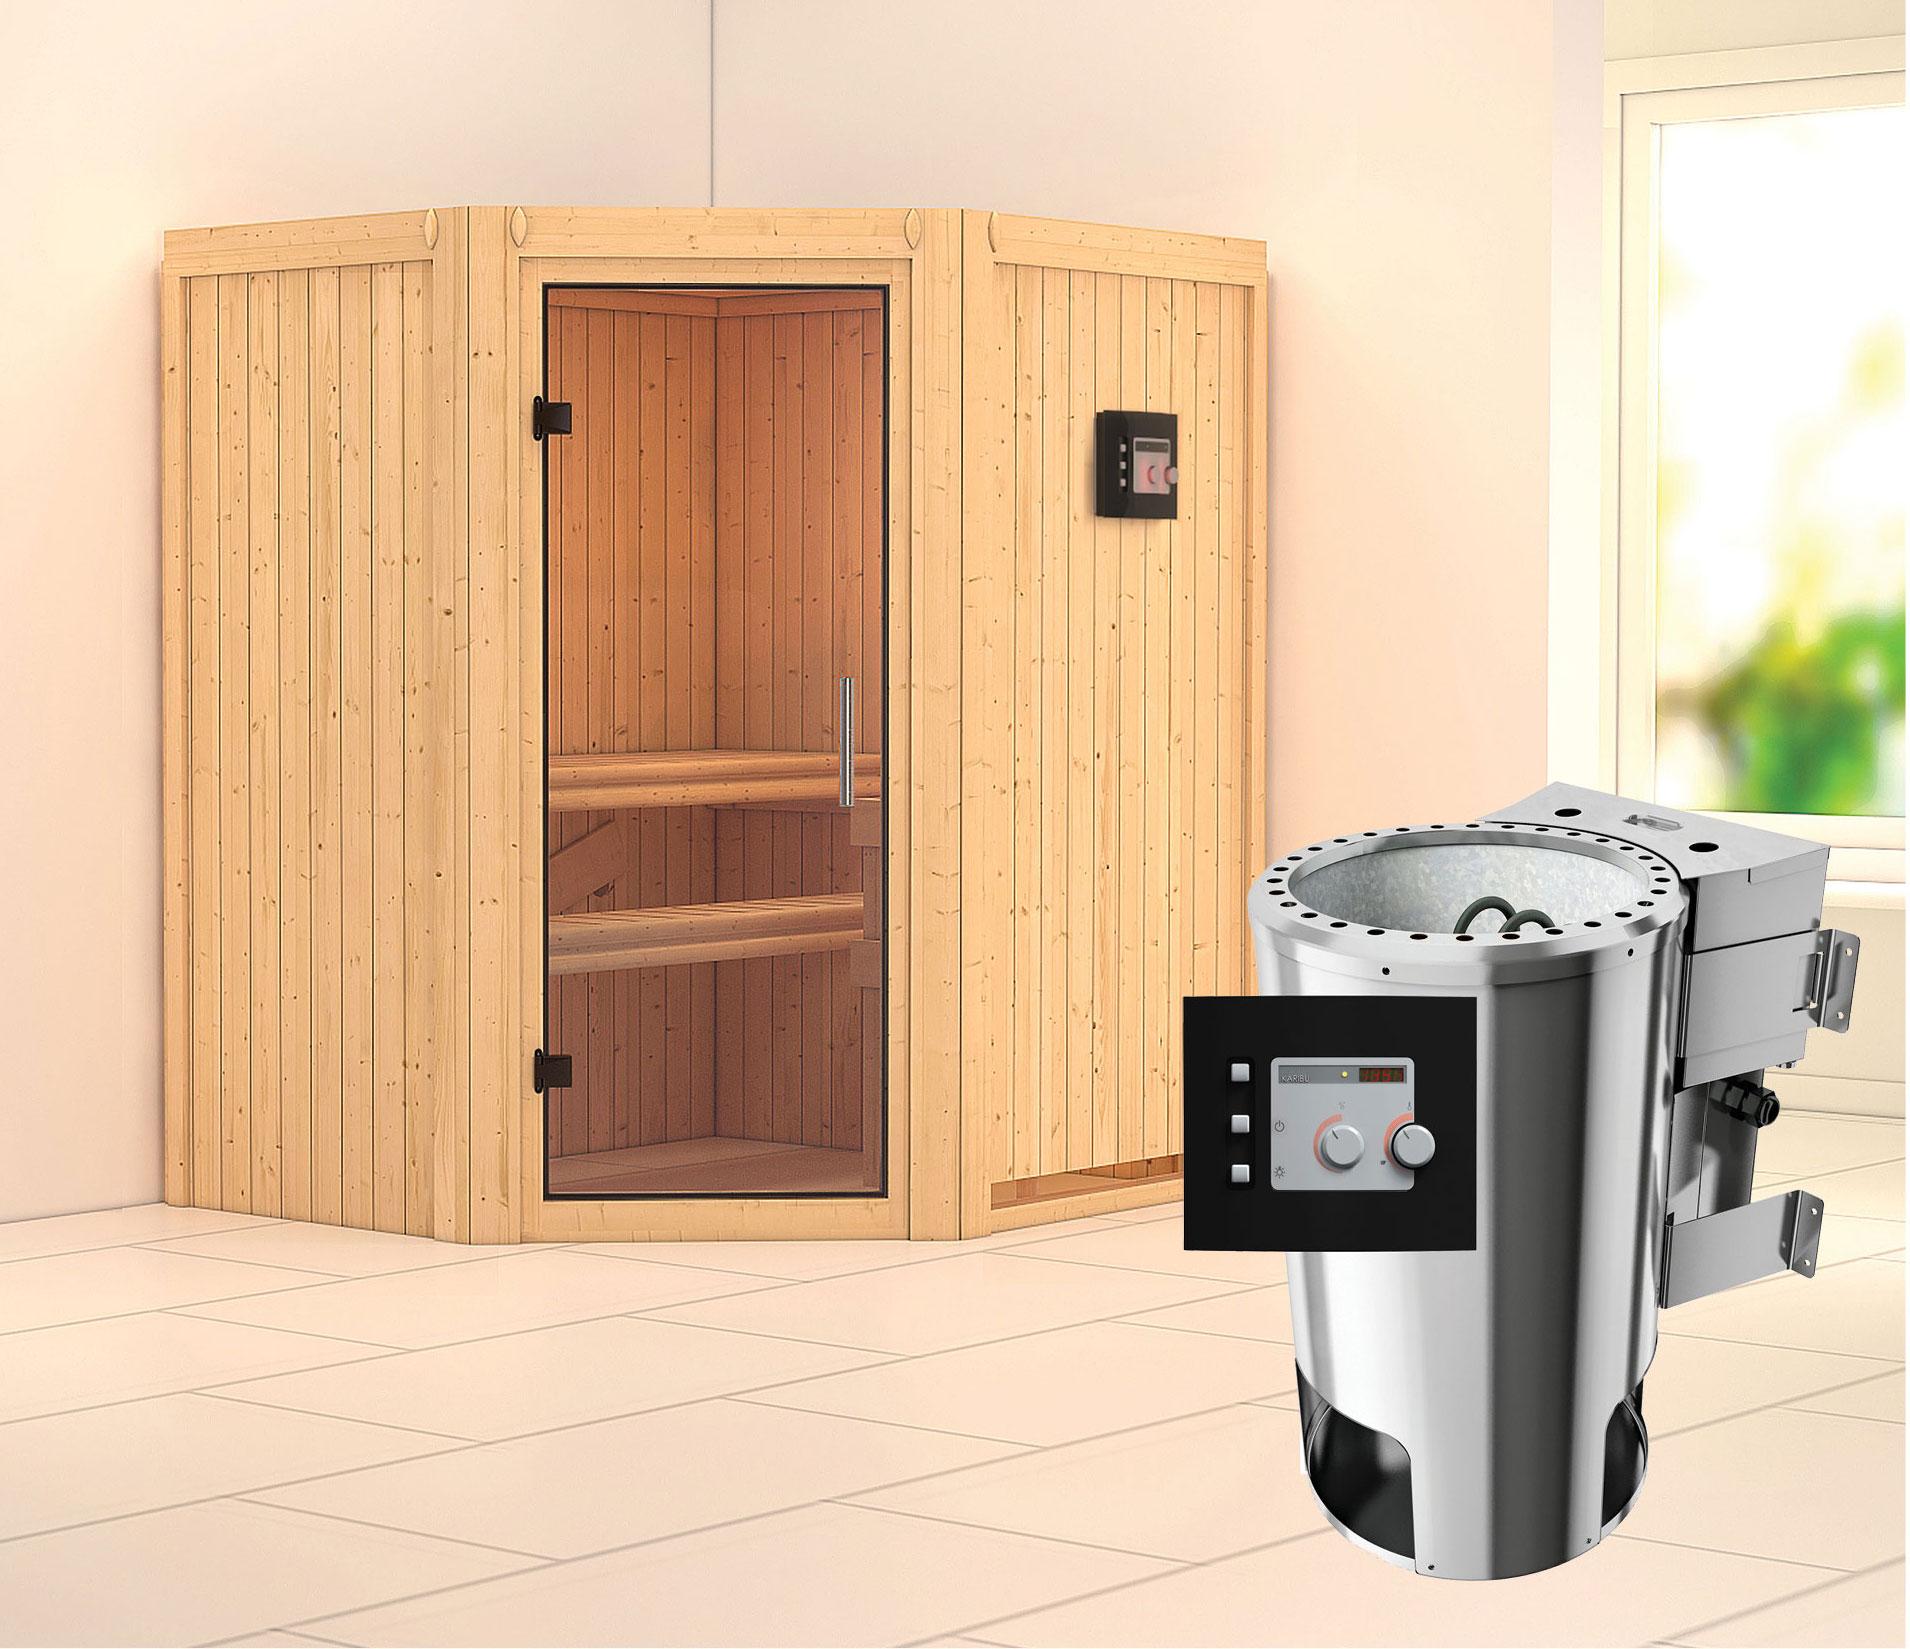 Karibu Sauna Tonja 68mm 230v Bio Saunaofen 3 6kw Extern Klarglastur